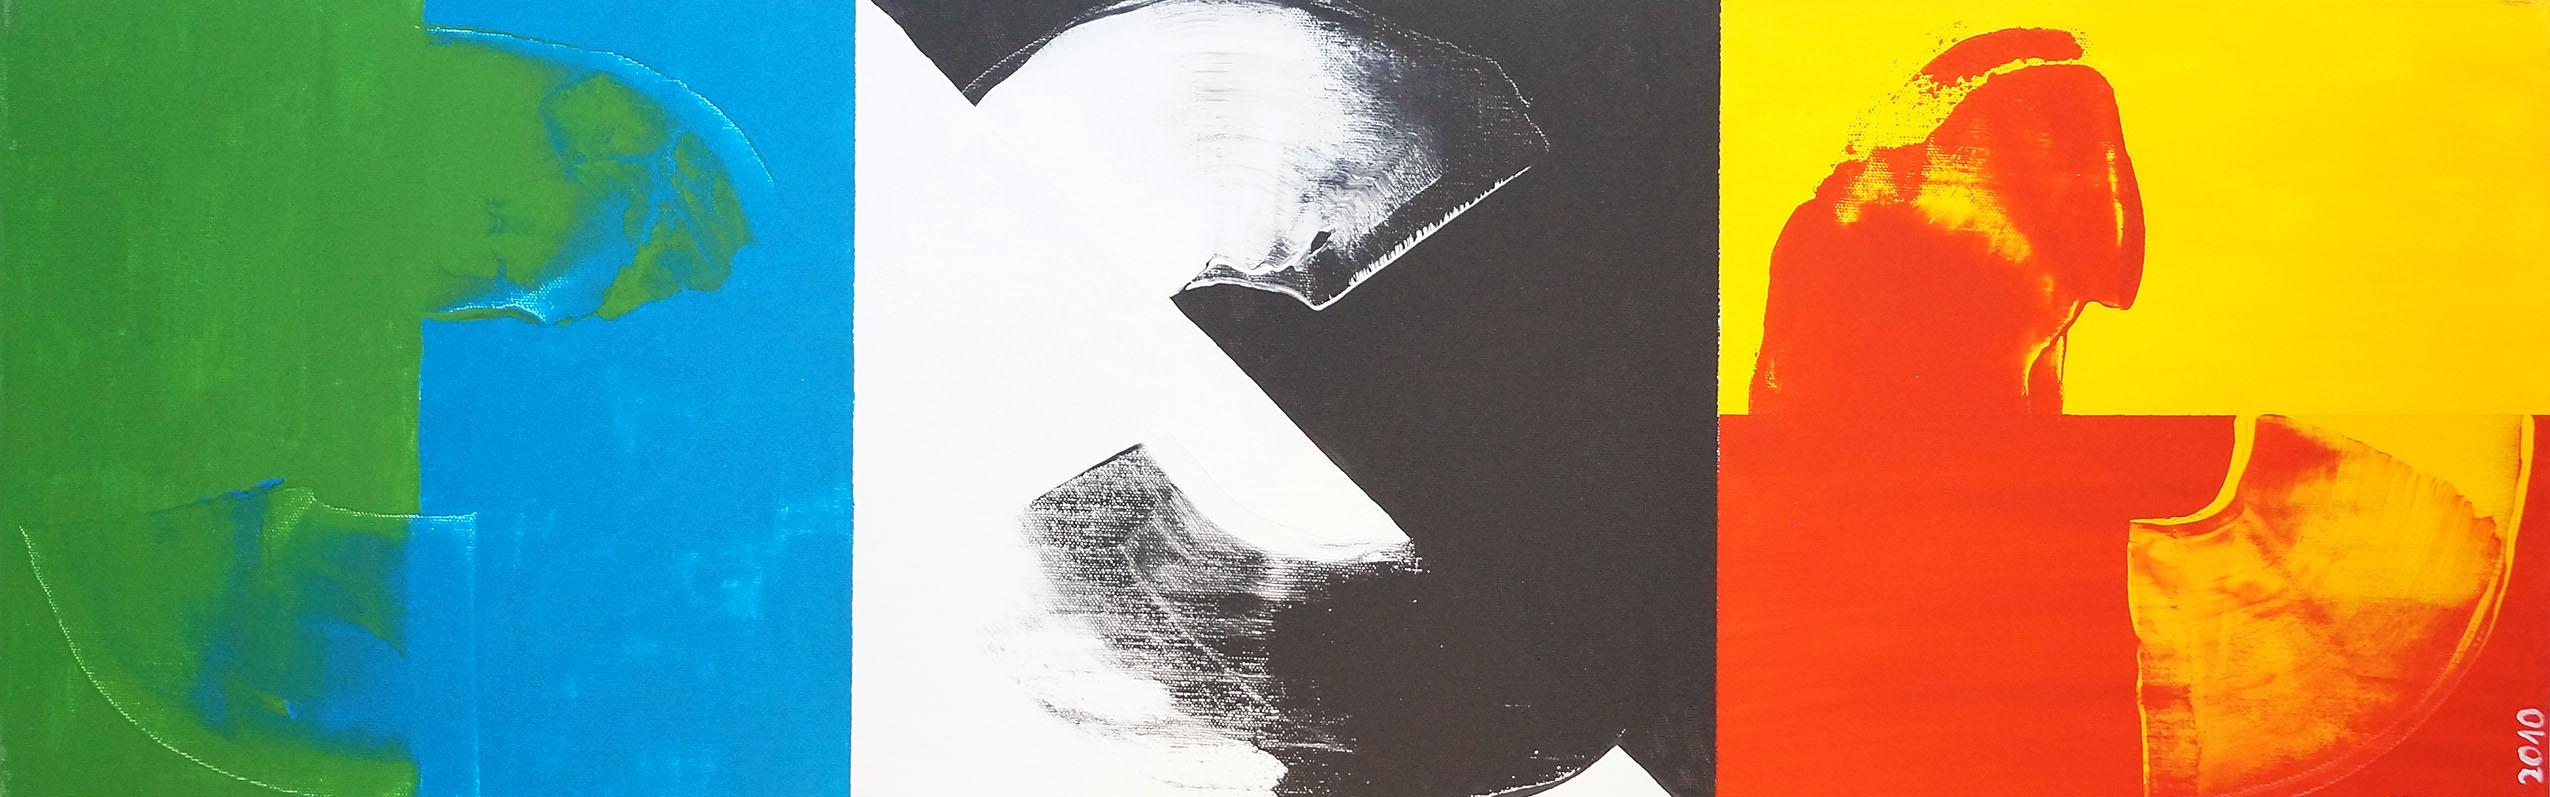 heikowski-yin-yang-light-2550-797